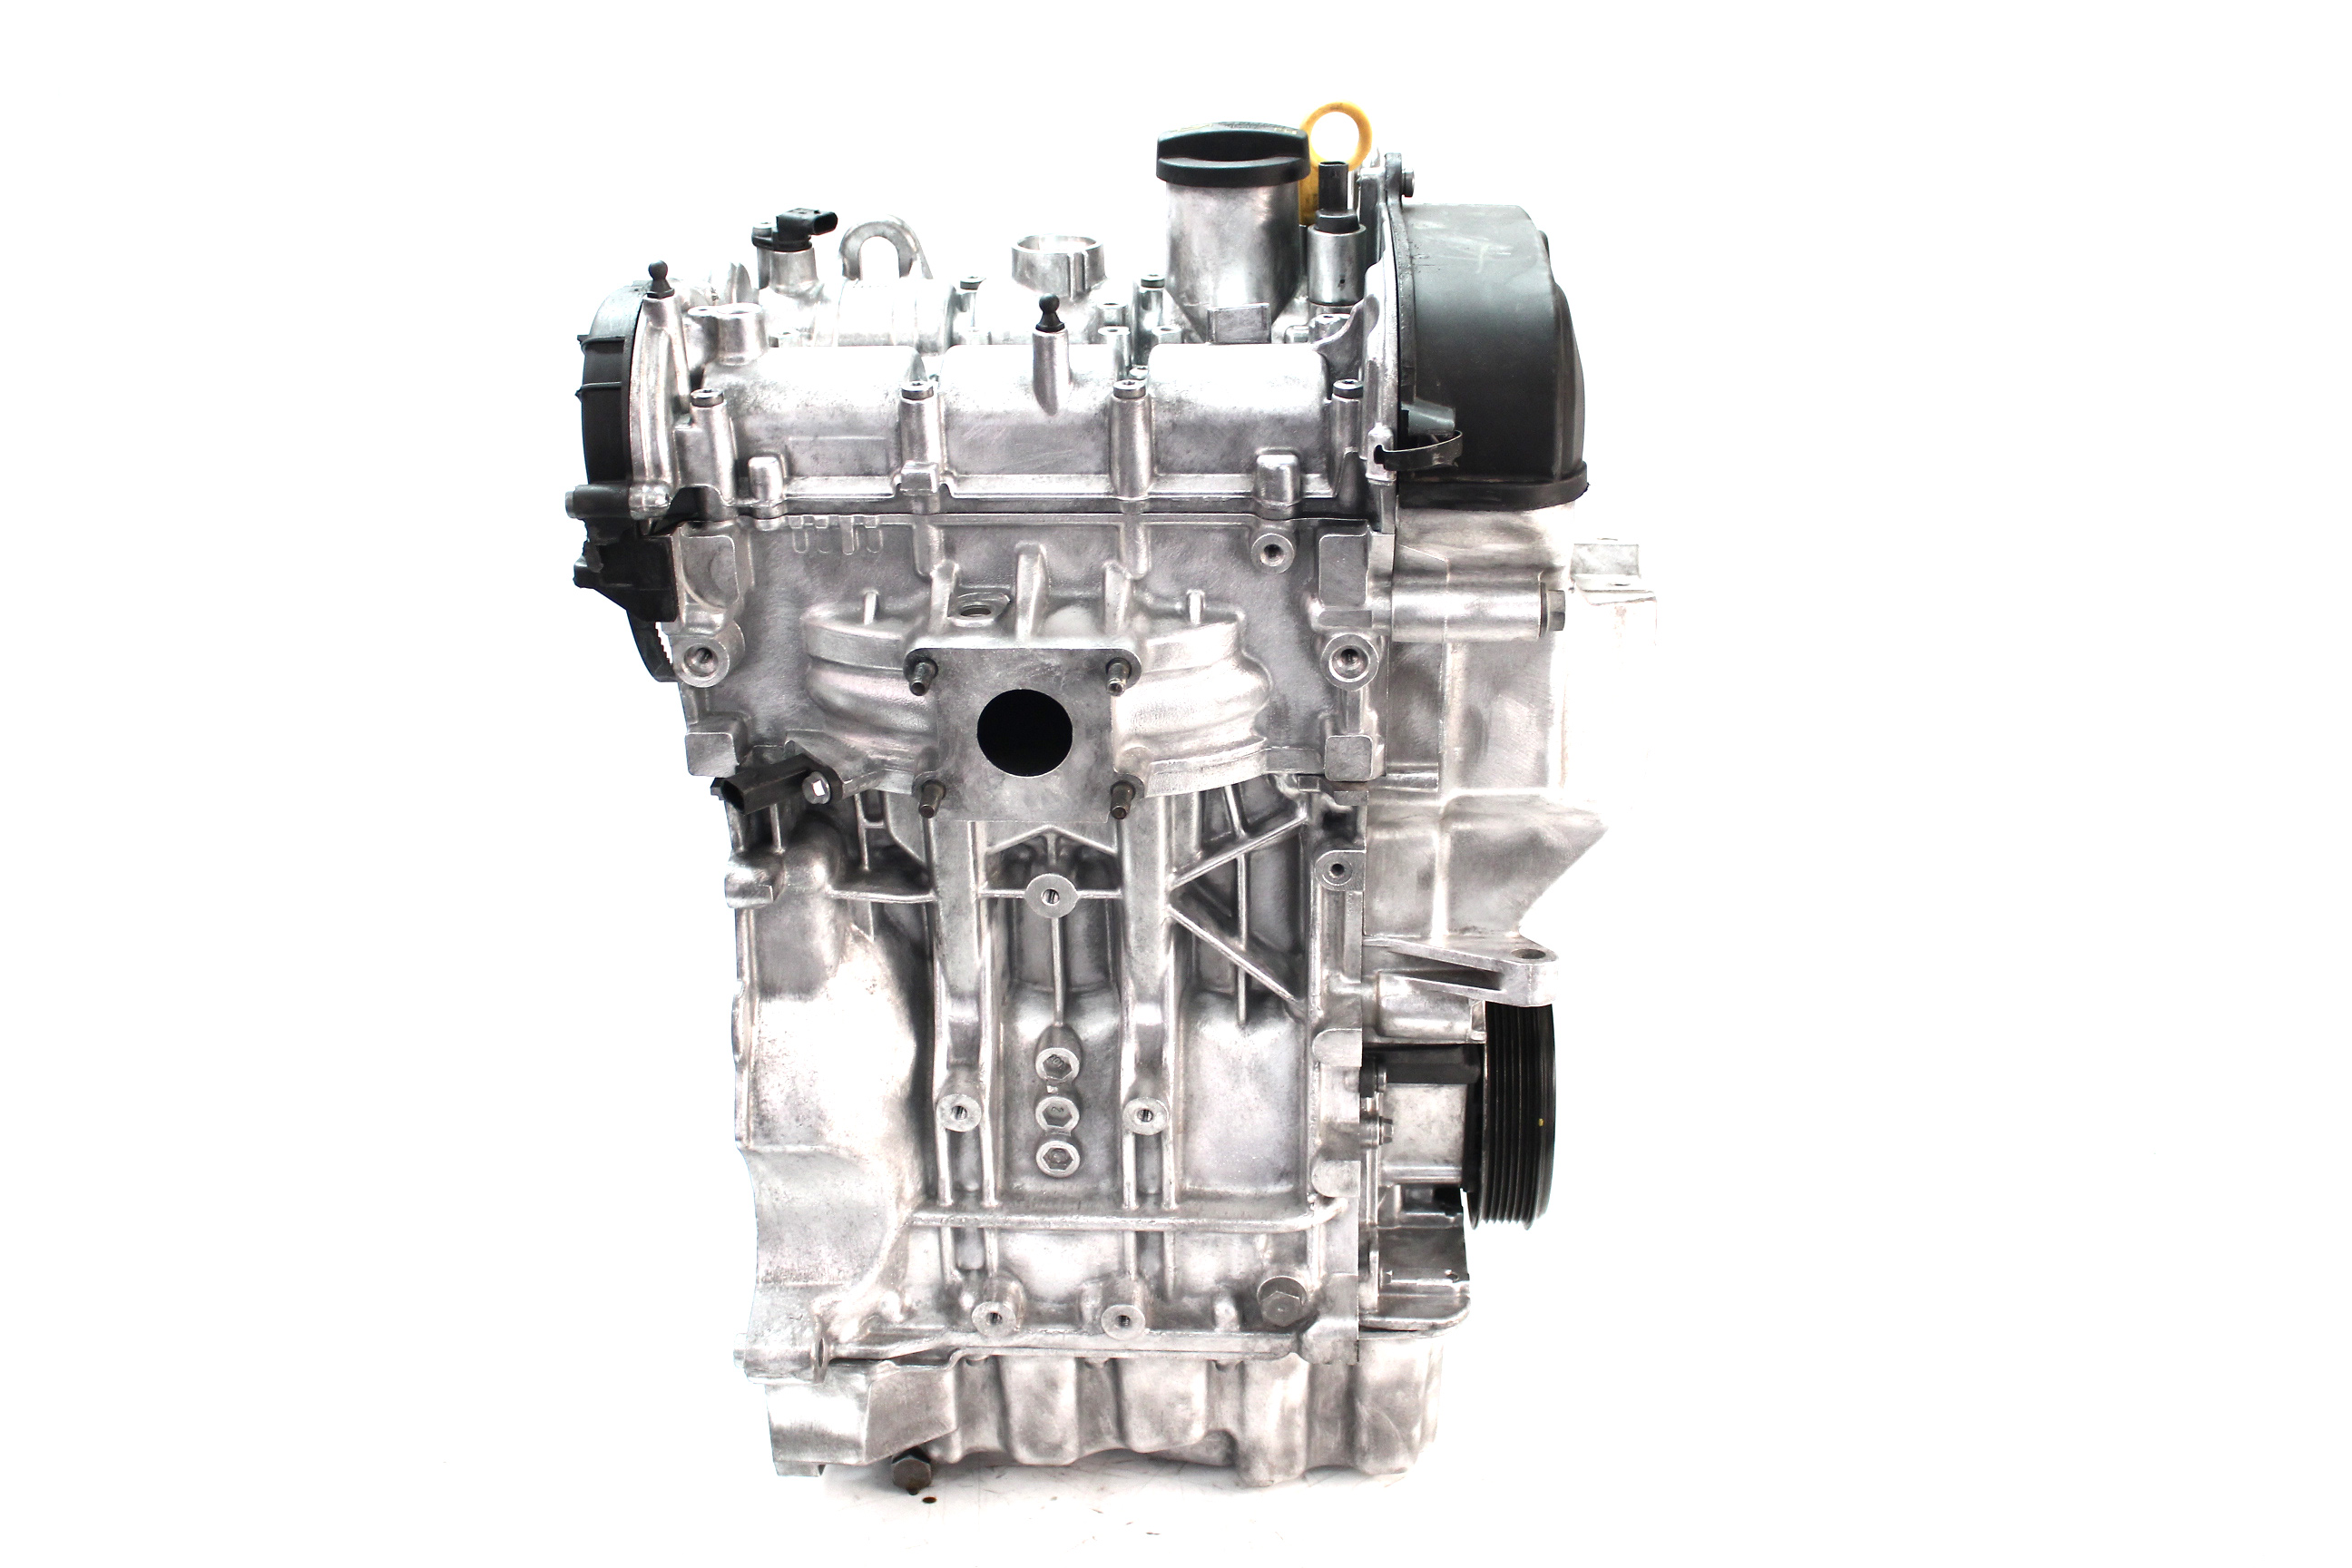 Motor VW Skoda Seat Mii Ibiza V ST Citigo Fabia Polo UP 1,0 CHYA CHYB CHY